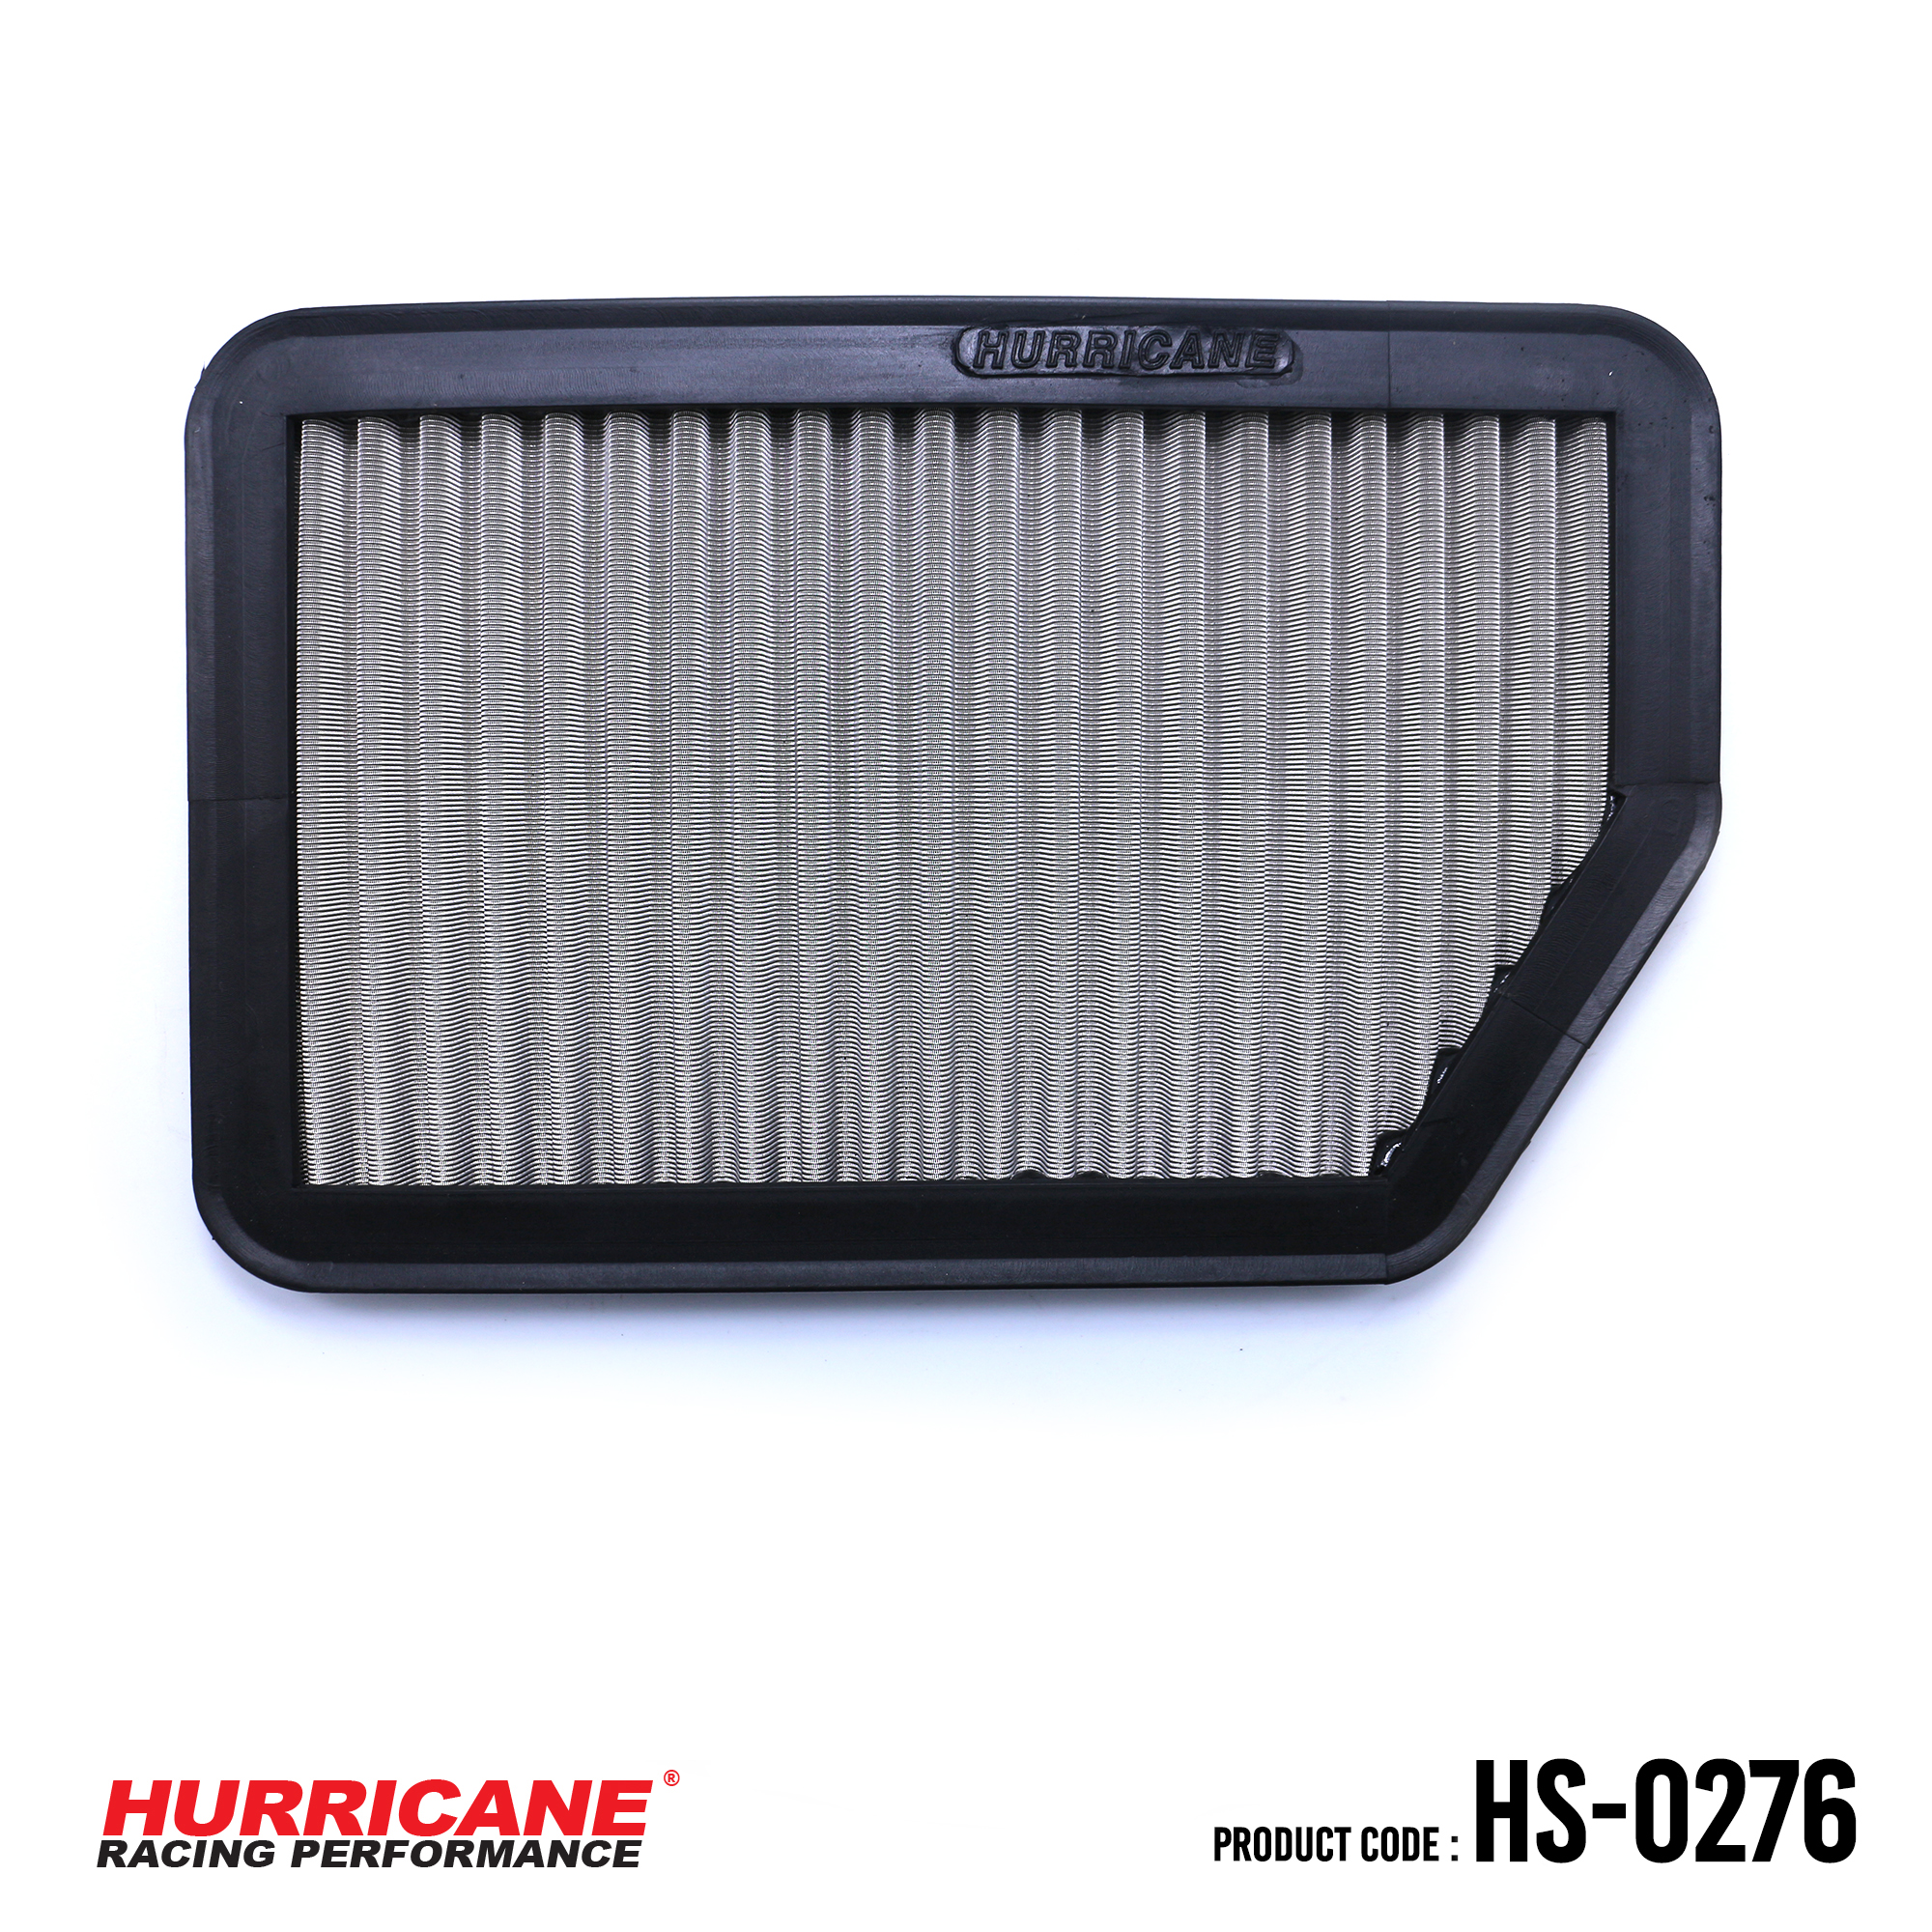 HURRICANE STAINLESS STEEL AIR FILTER FOR HS-0276 HyundaiKia